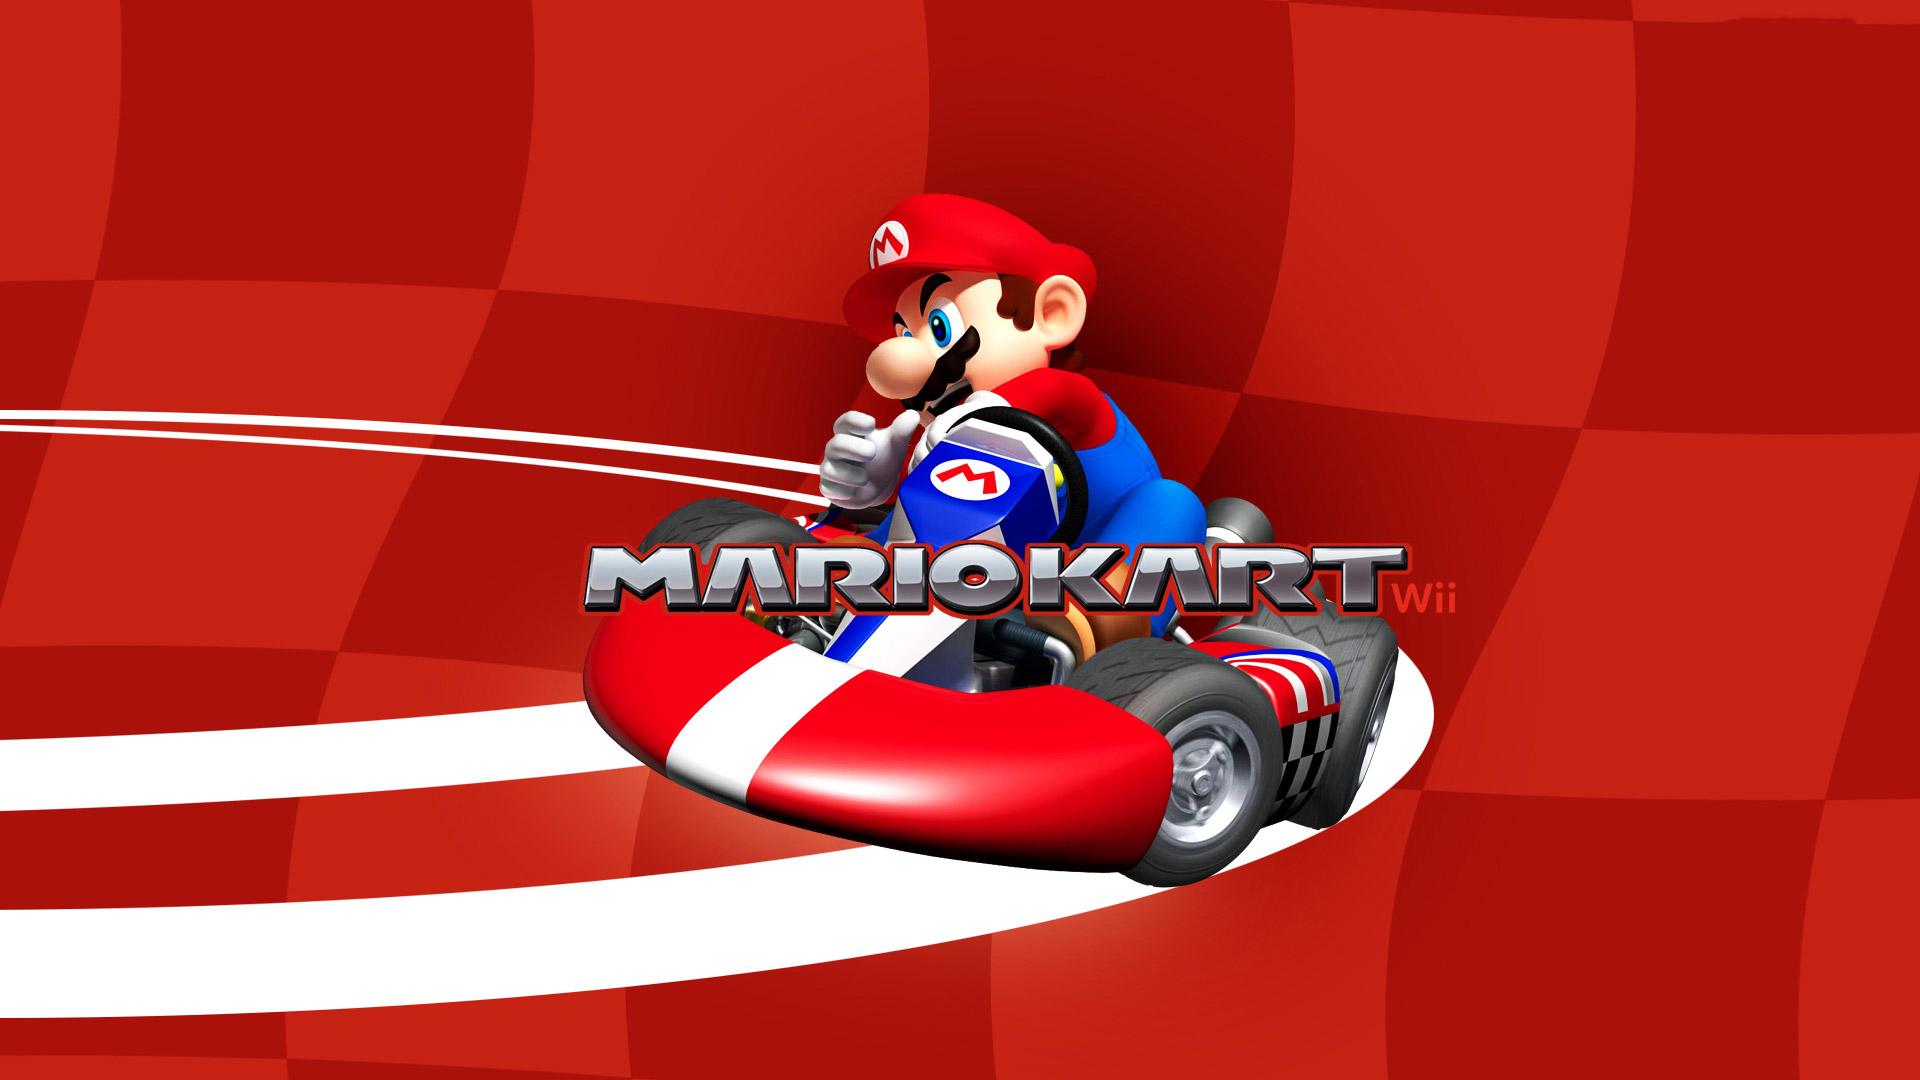 Free Mario Kart Wii Wallpaper in 1920x1080